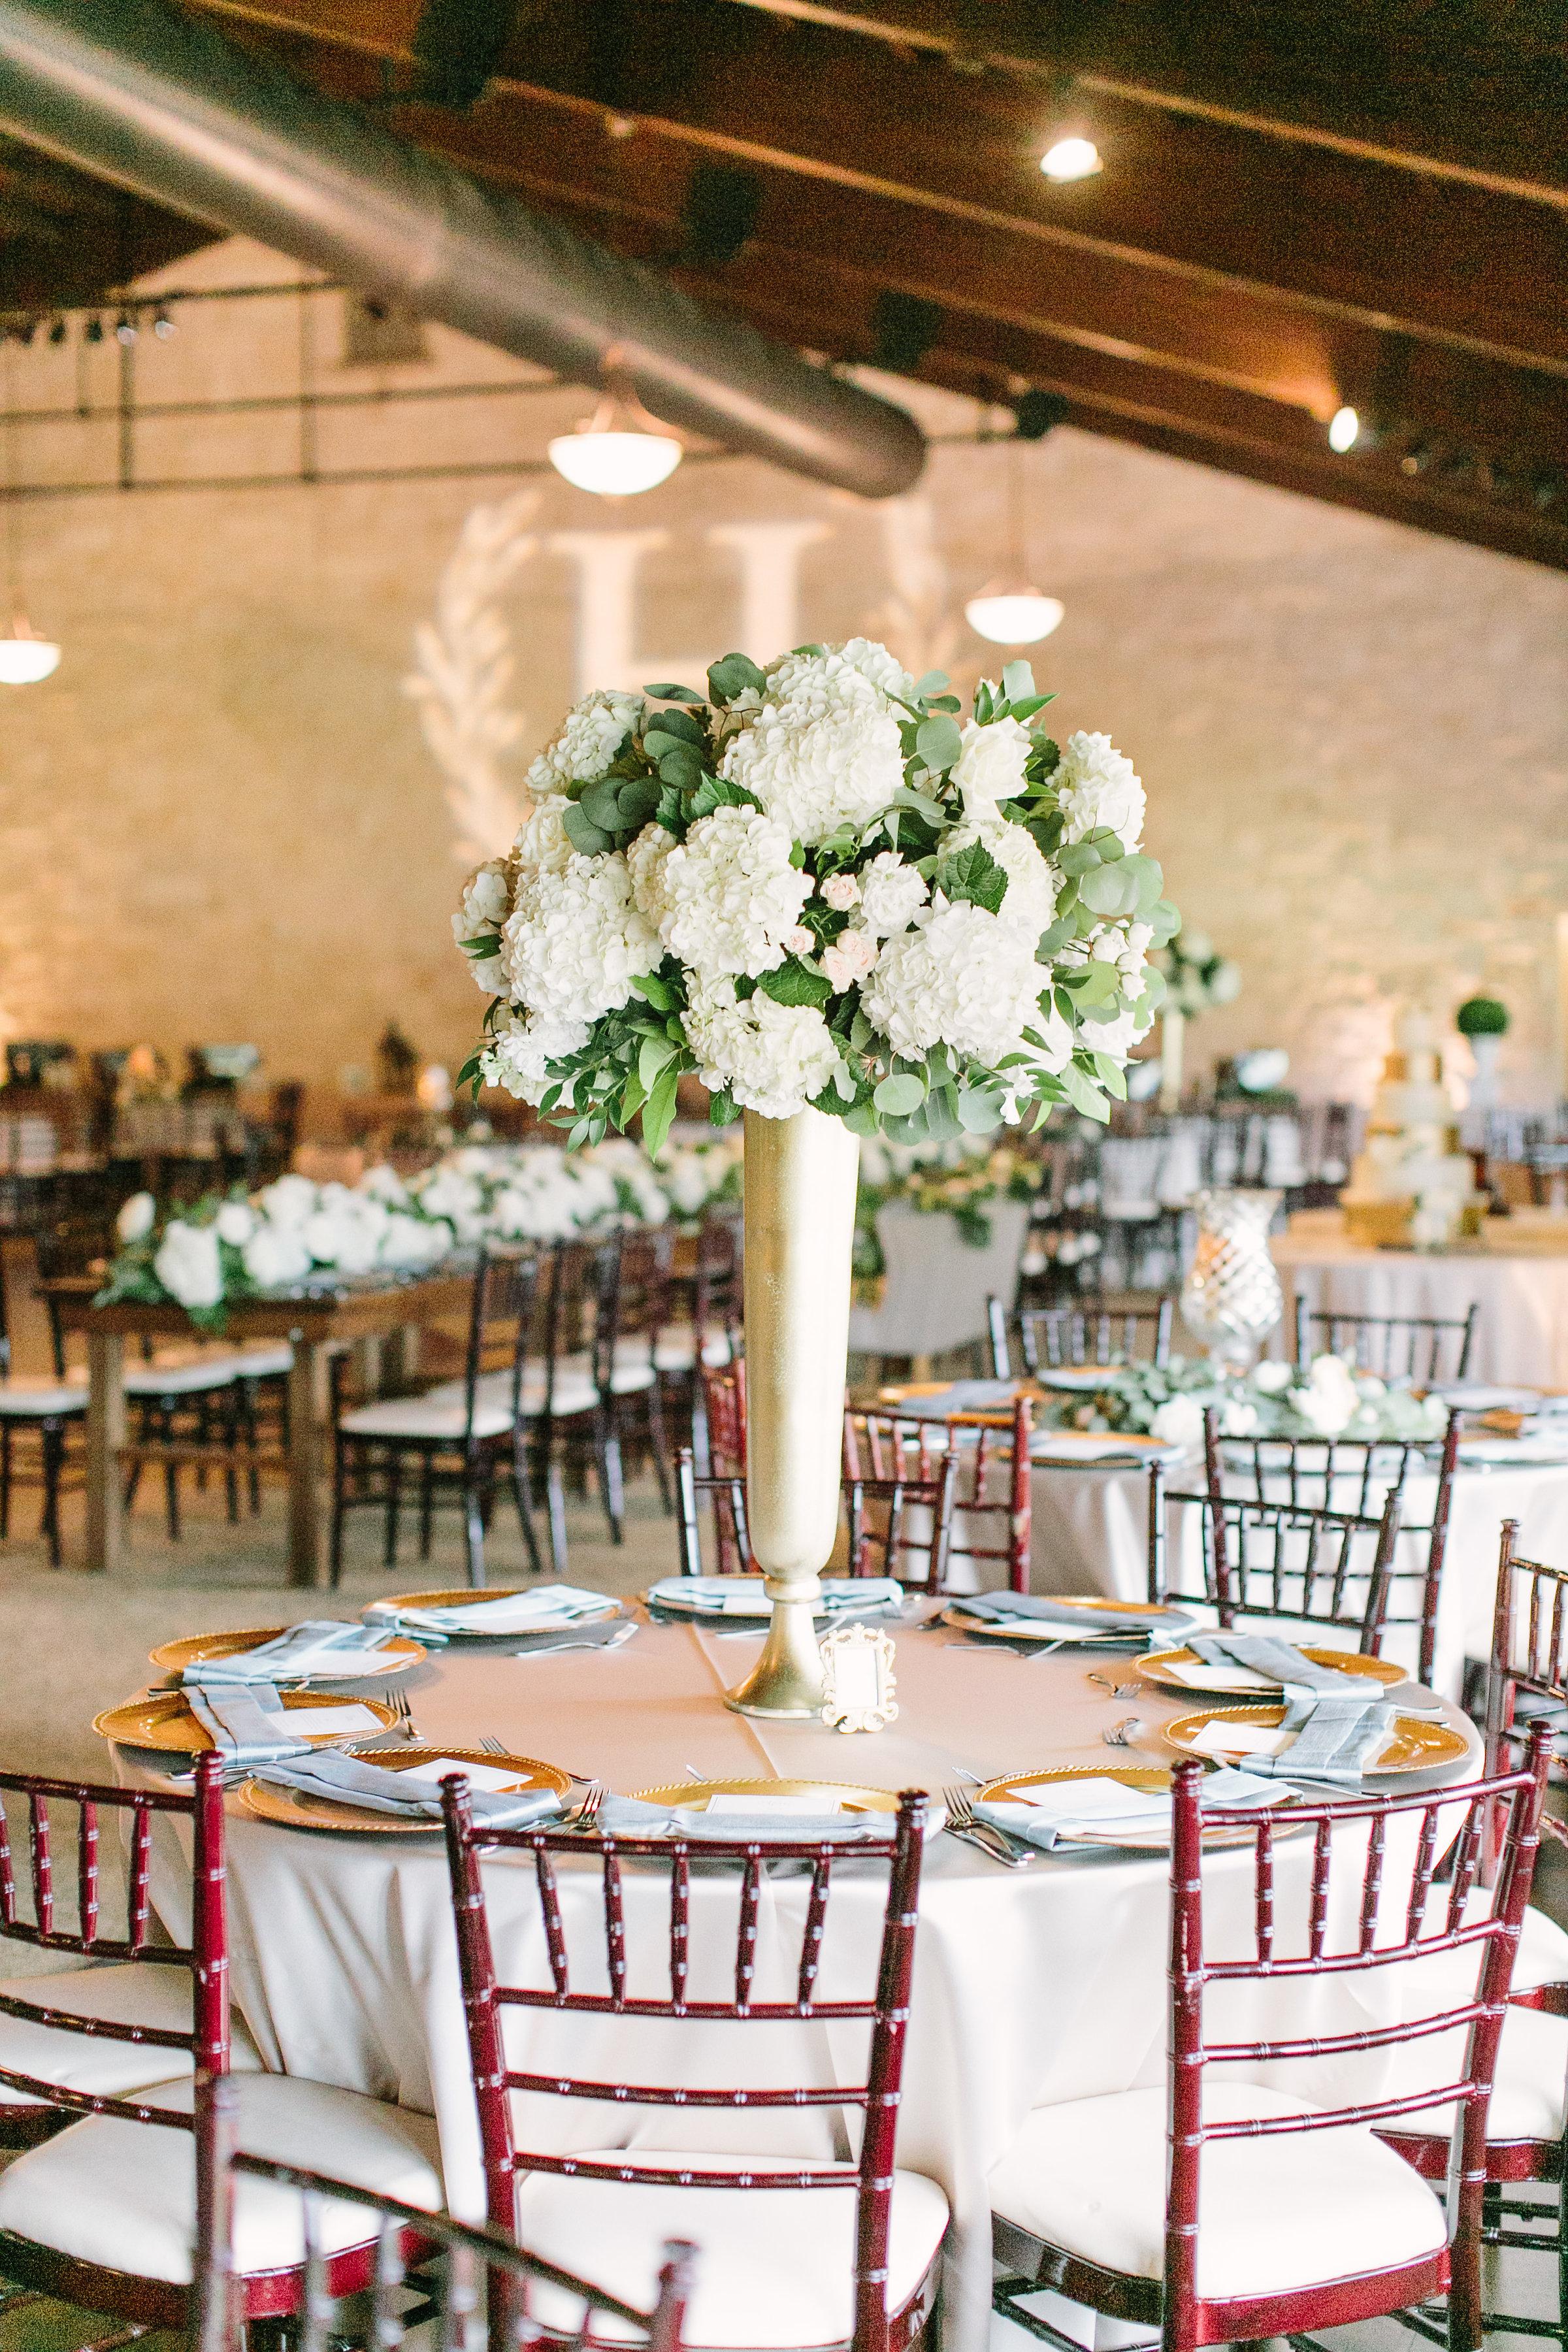 tall-arrangement-gold-vase-white-hydranga-greenery-by-maxit-flower-design-in-houston-texas